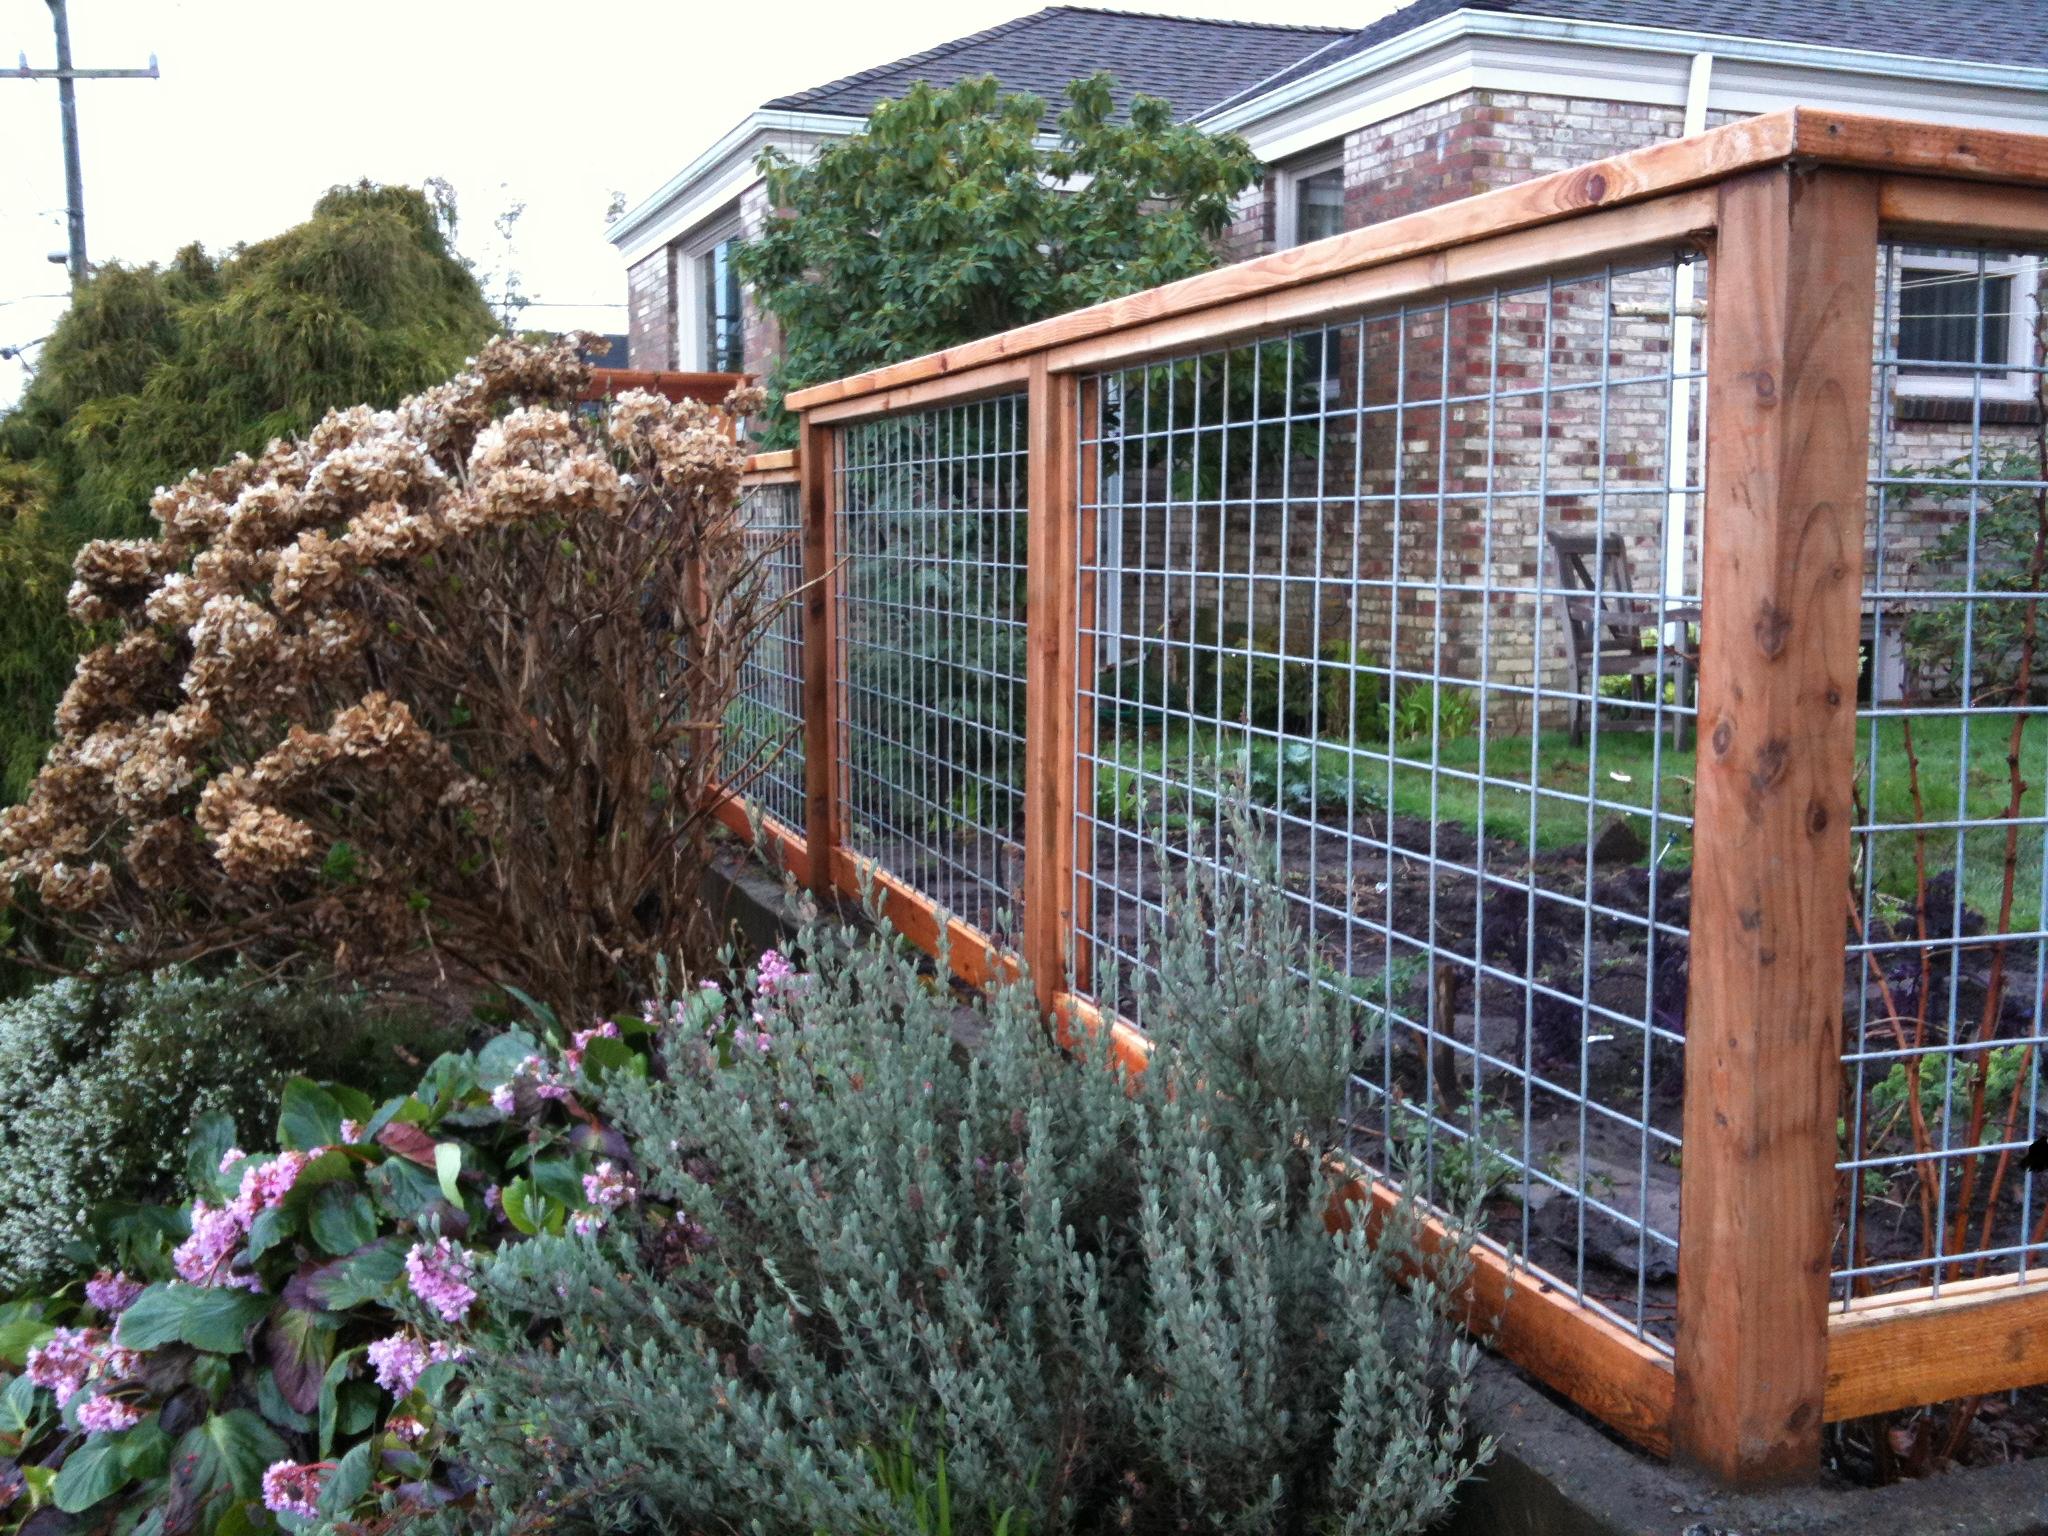 garden fence backyard vegetable garden | backyard vegetable garden ideas | woodworking  project plans, 2048x1536 . YAIDXIA